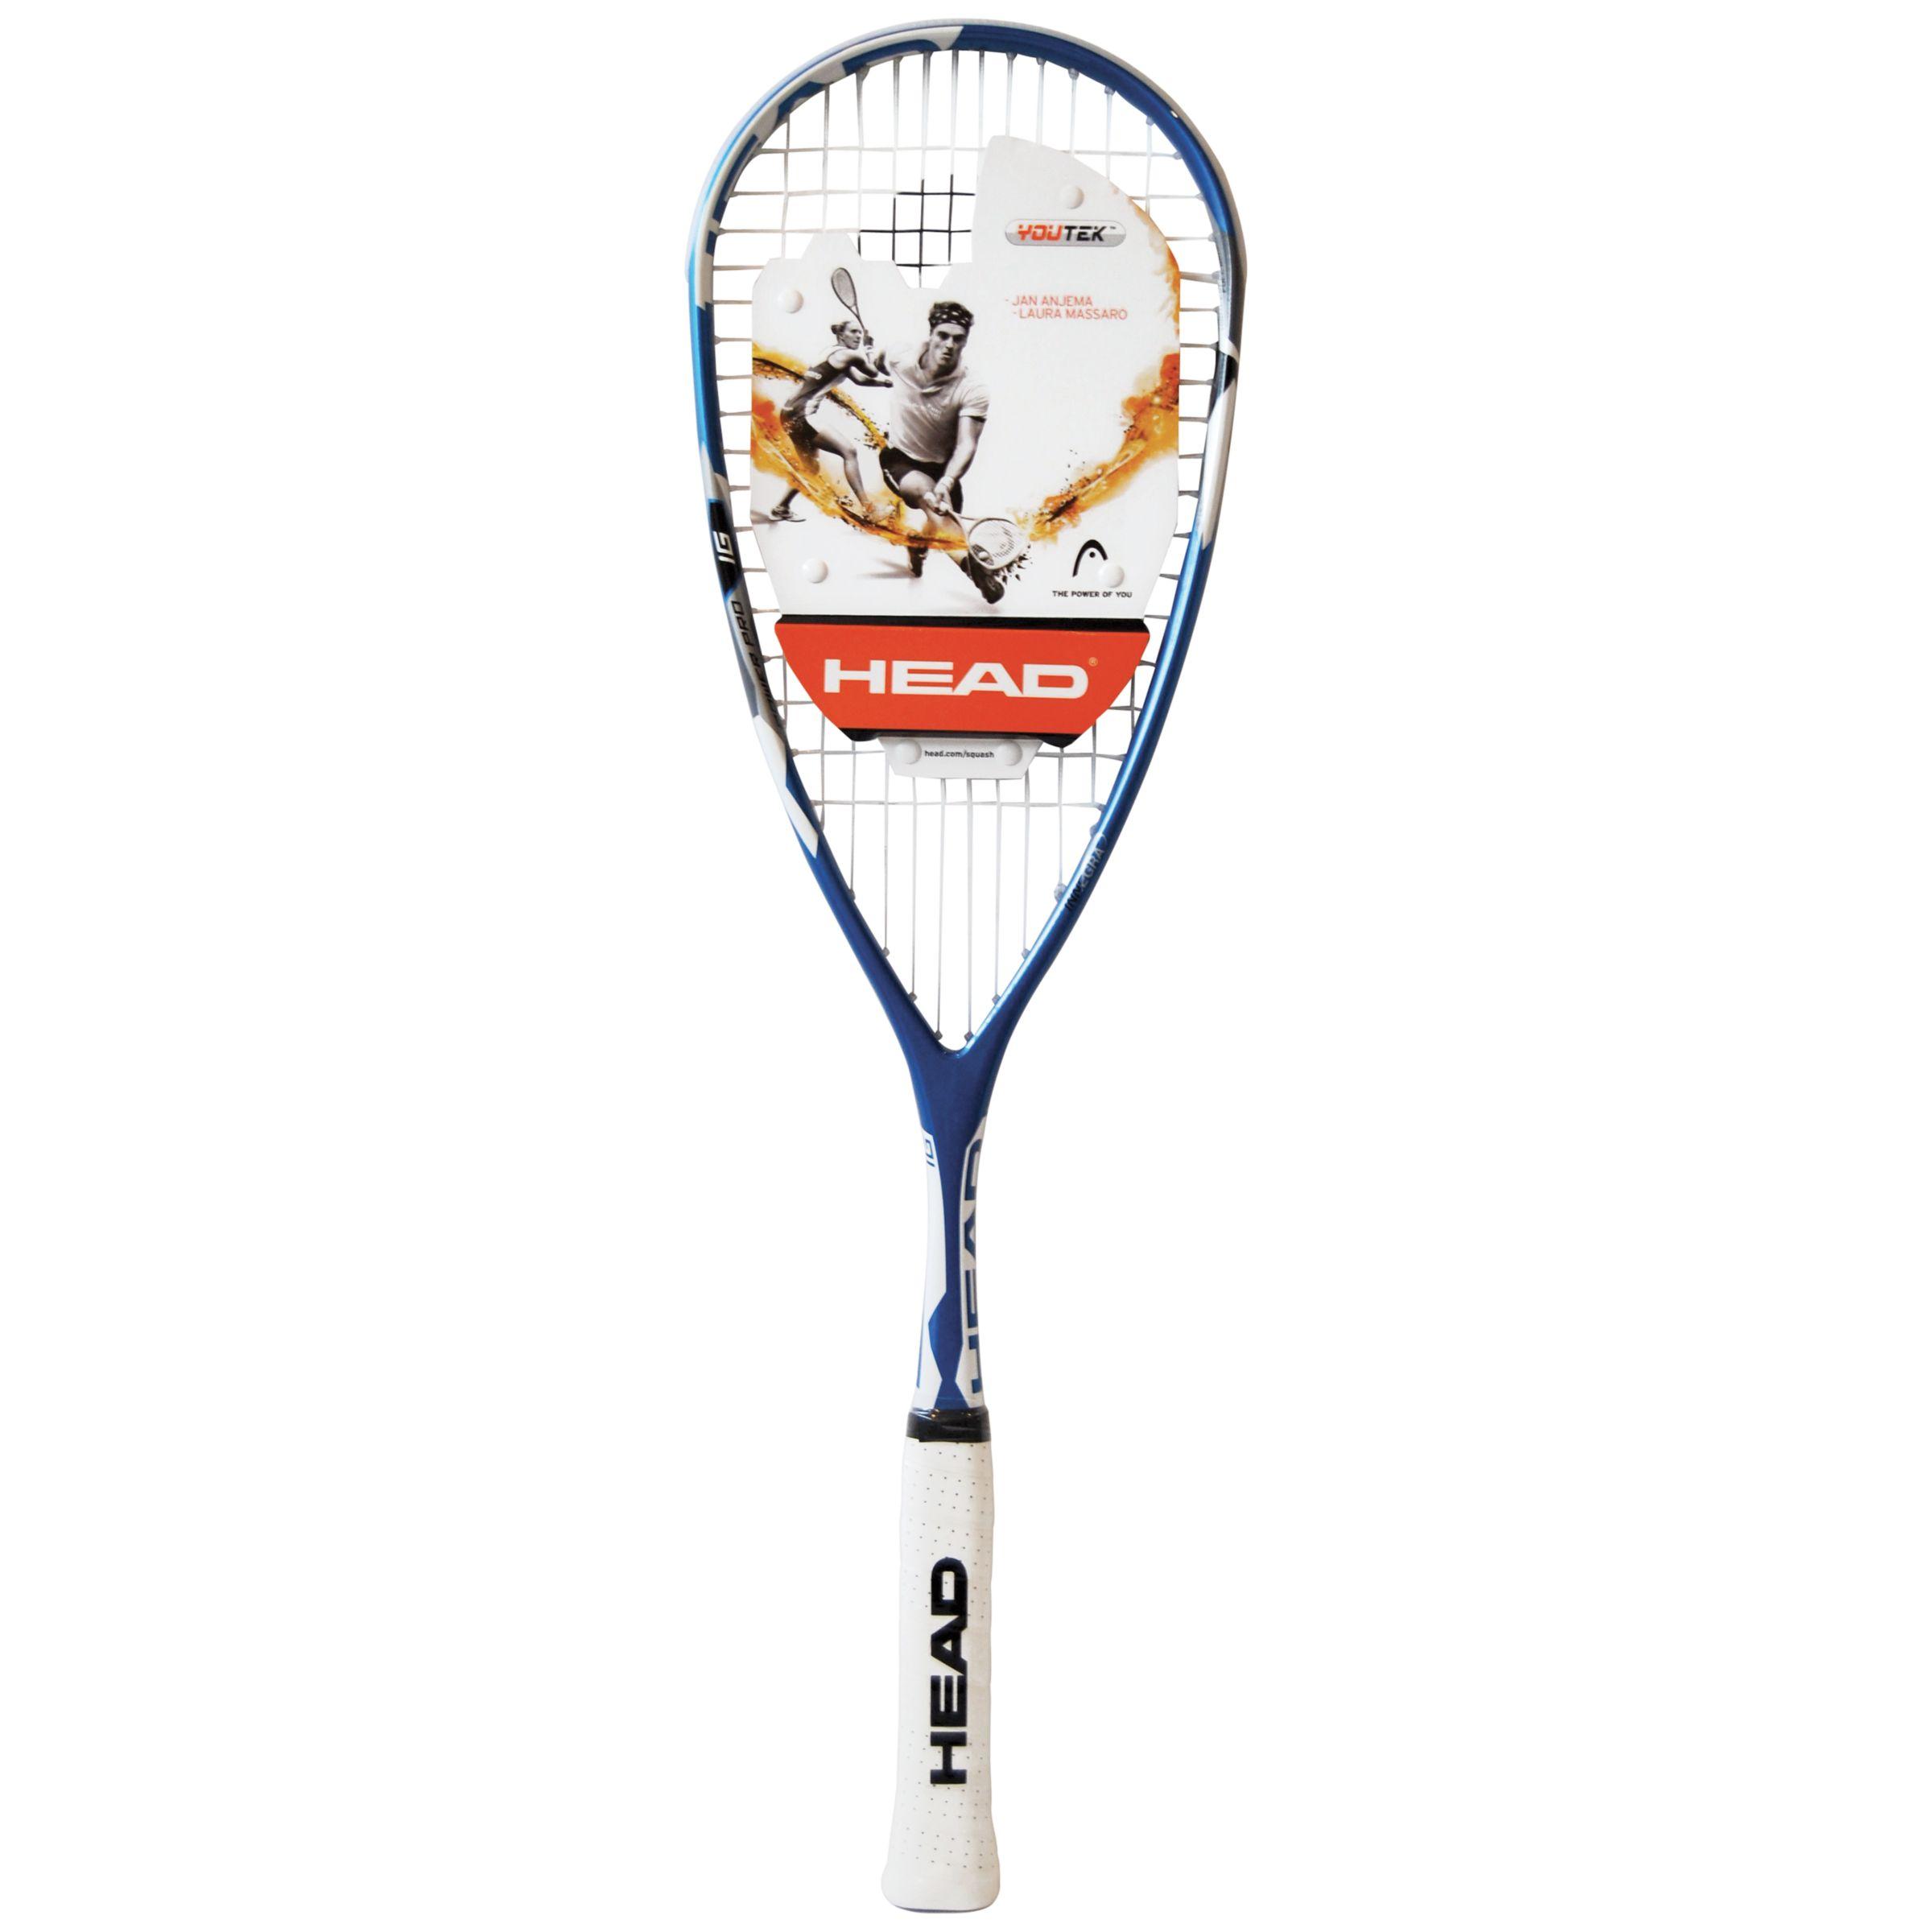 Head Head IG Power Pro Squash Racquet, Black/White